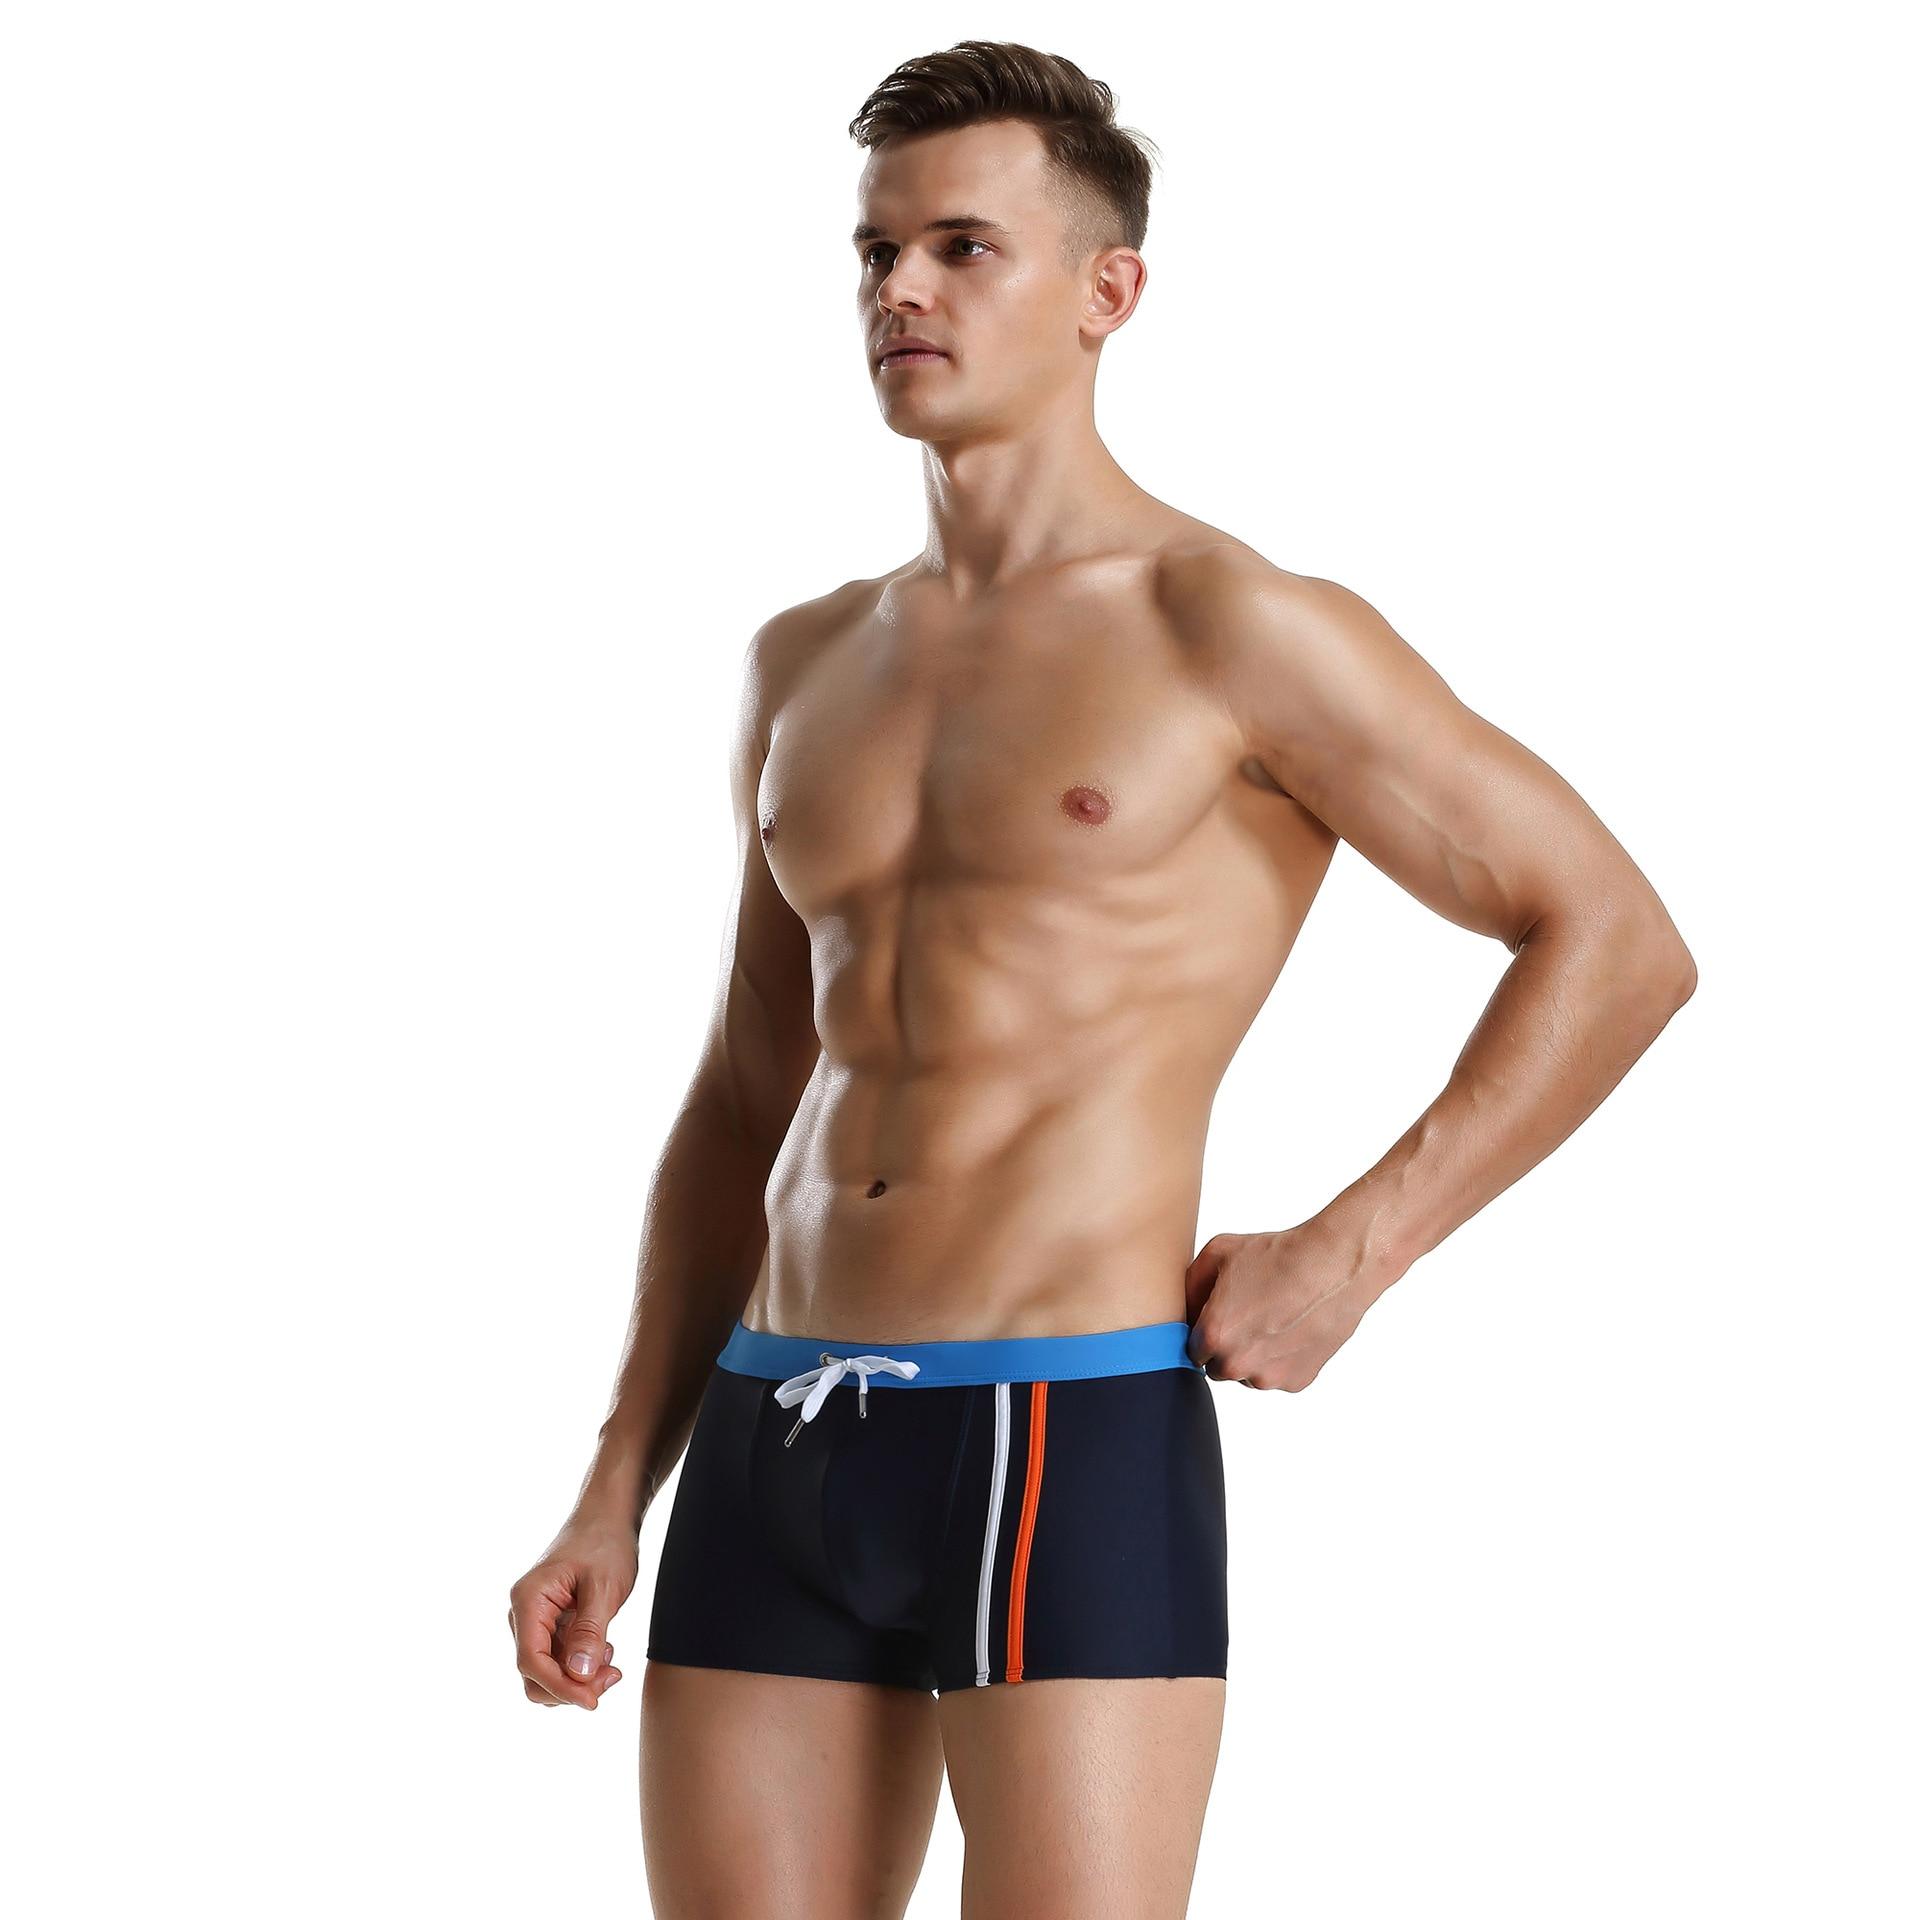 Foreign Trade 2018 Summer New Style Men AussieBum Men's Low-Rise Swim Shorts Manufacturers Wholesale Men's Bathing Suit